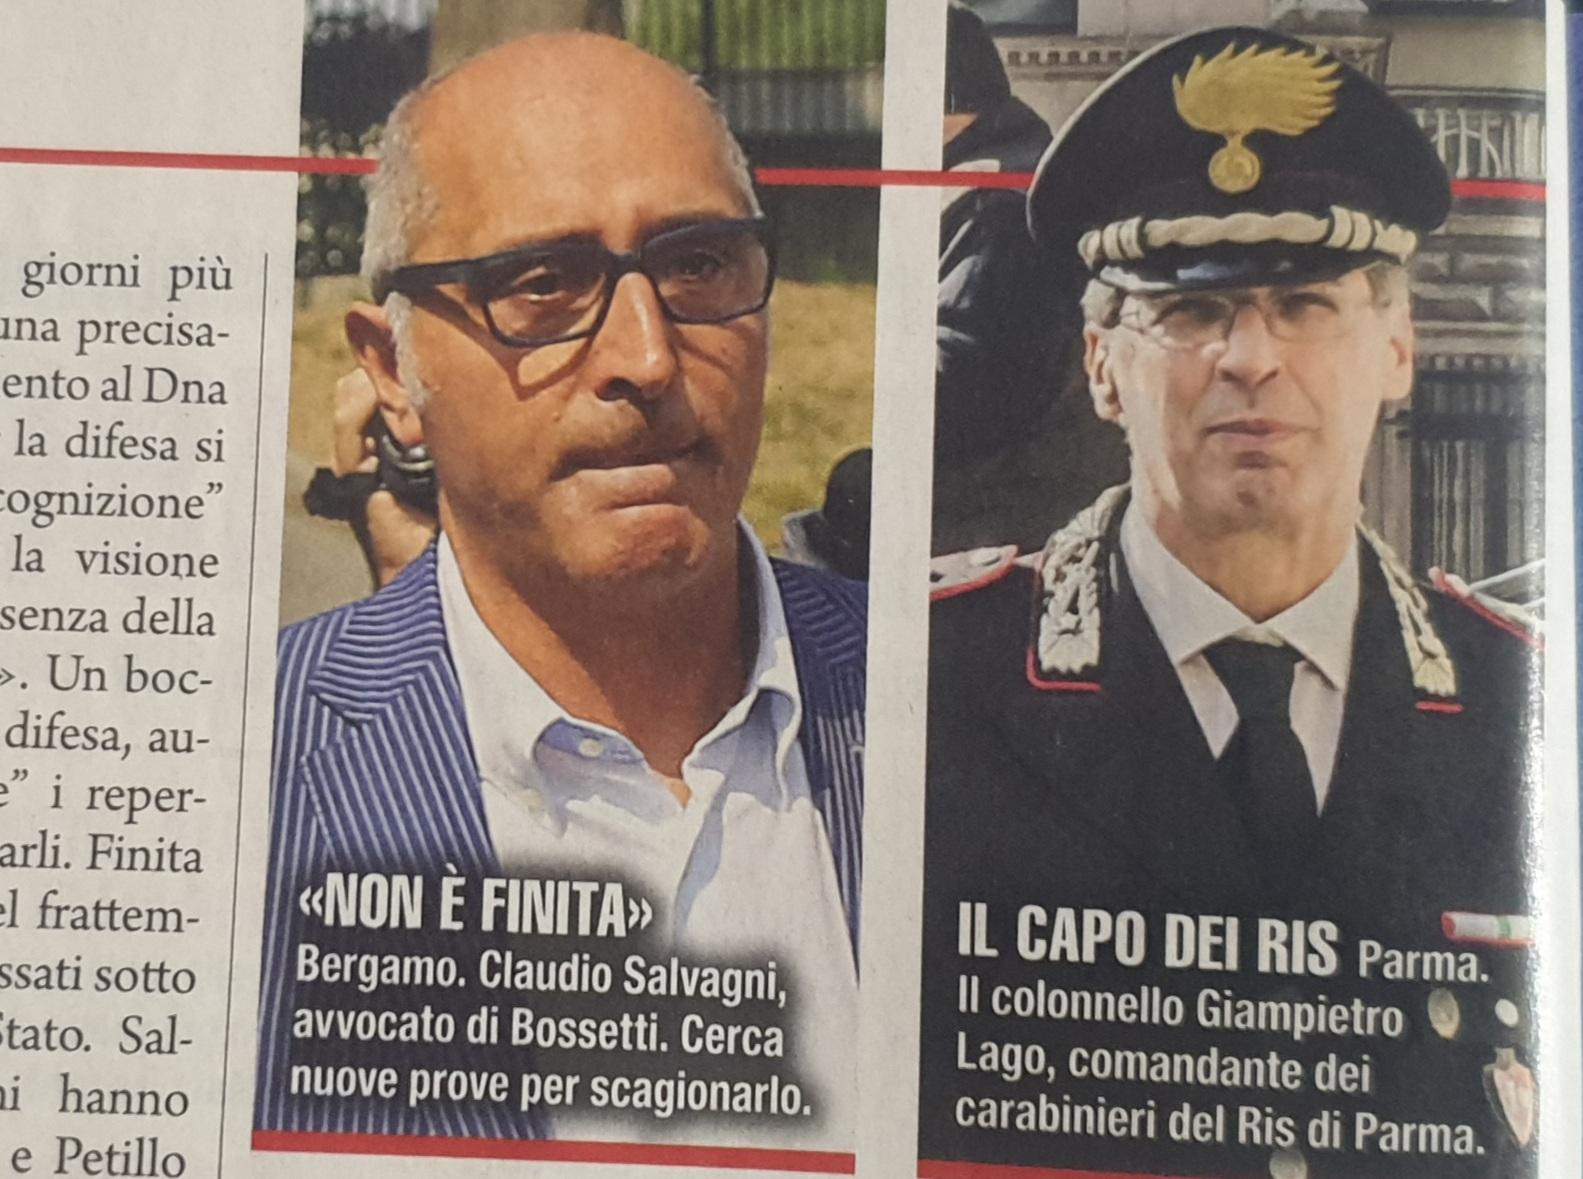 Yara, Massimo Bossetti denuncia i Ris